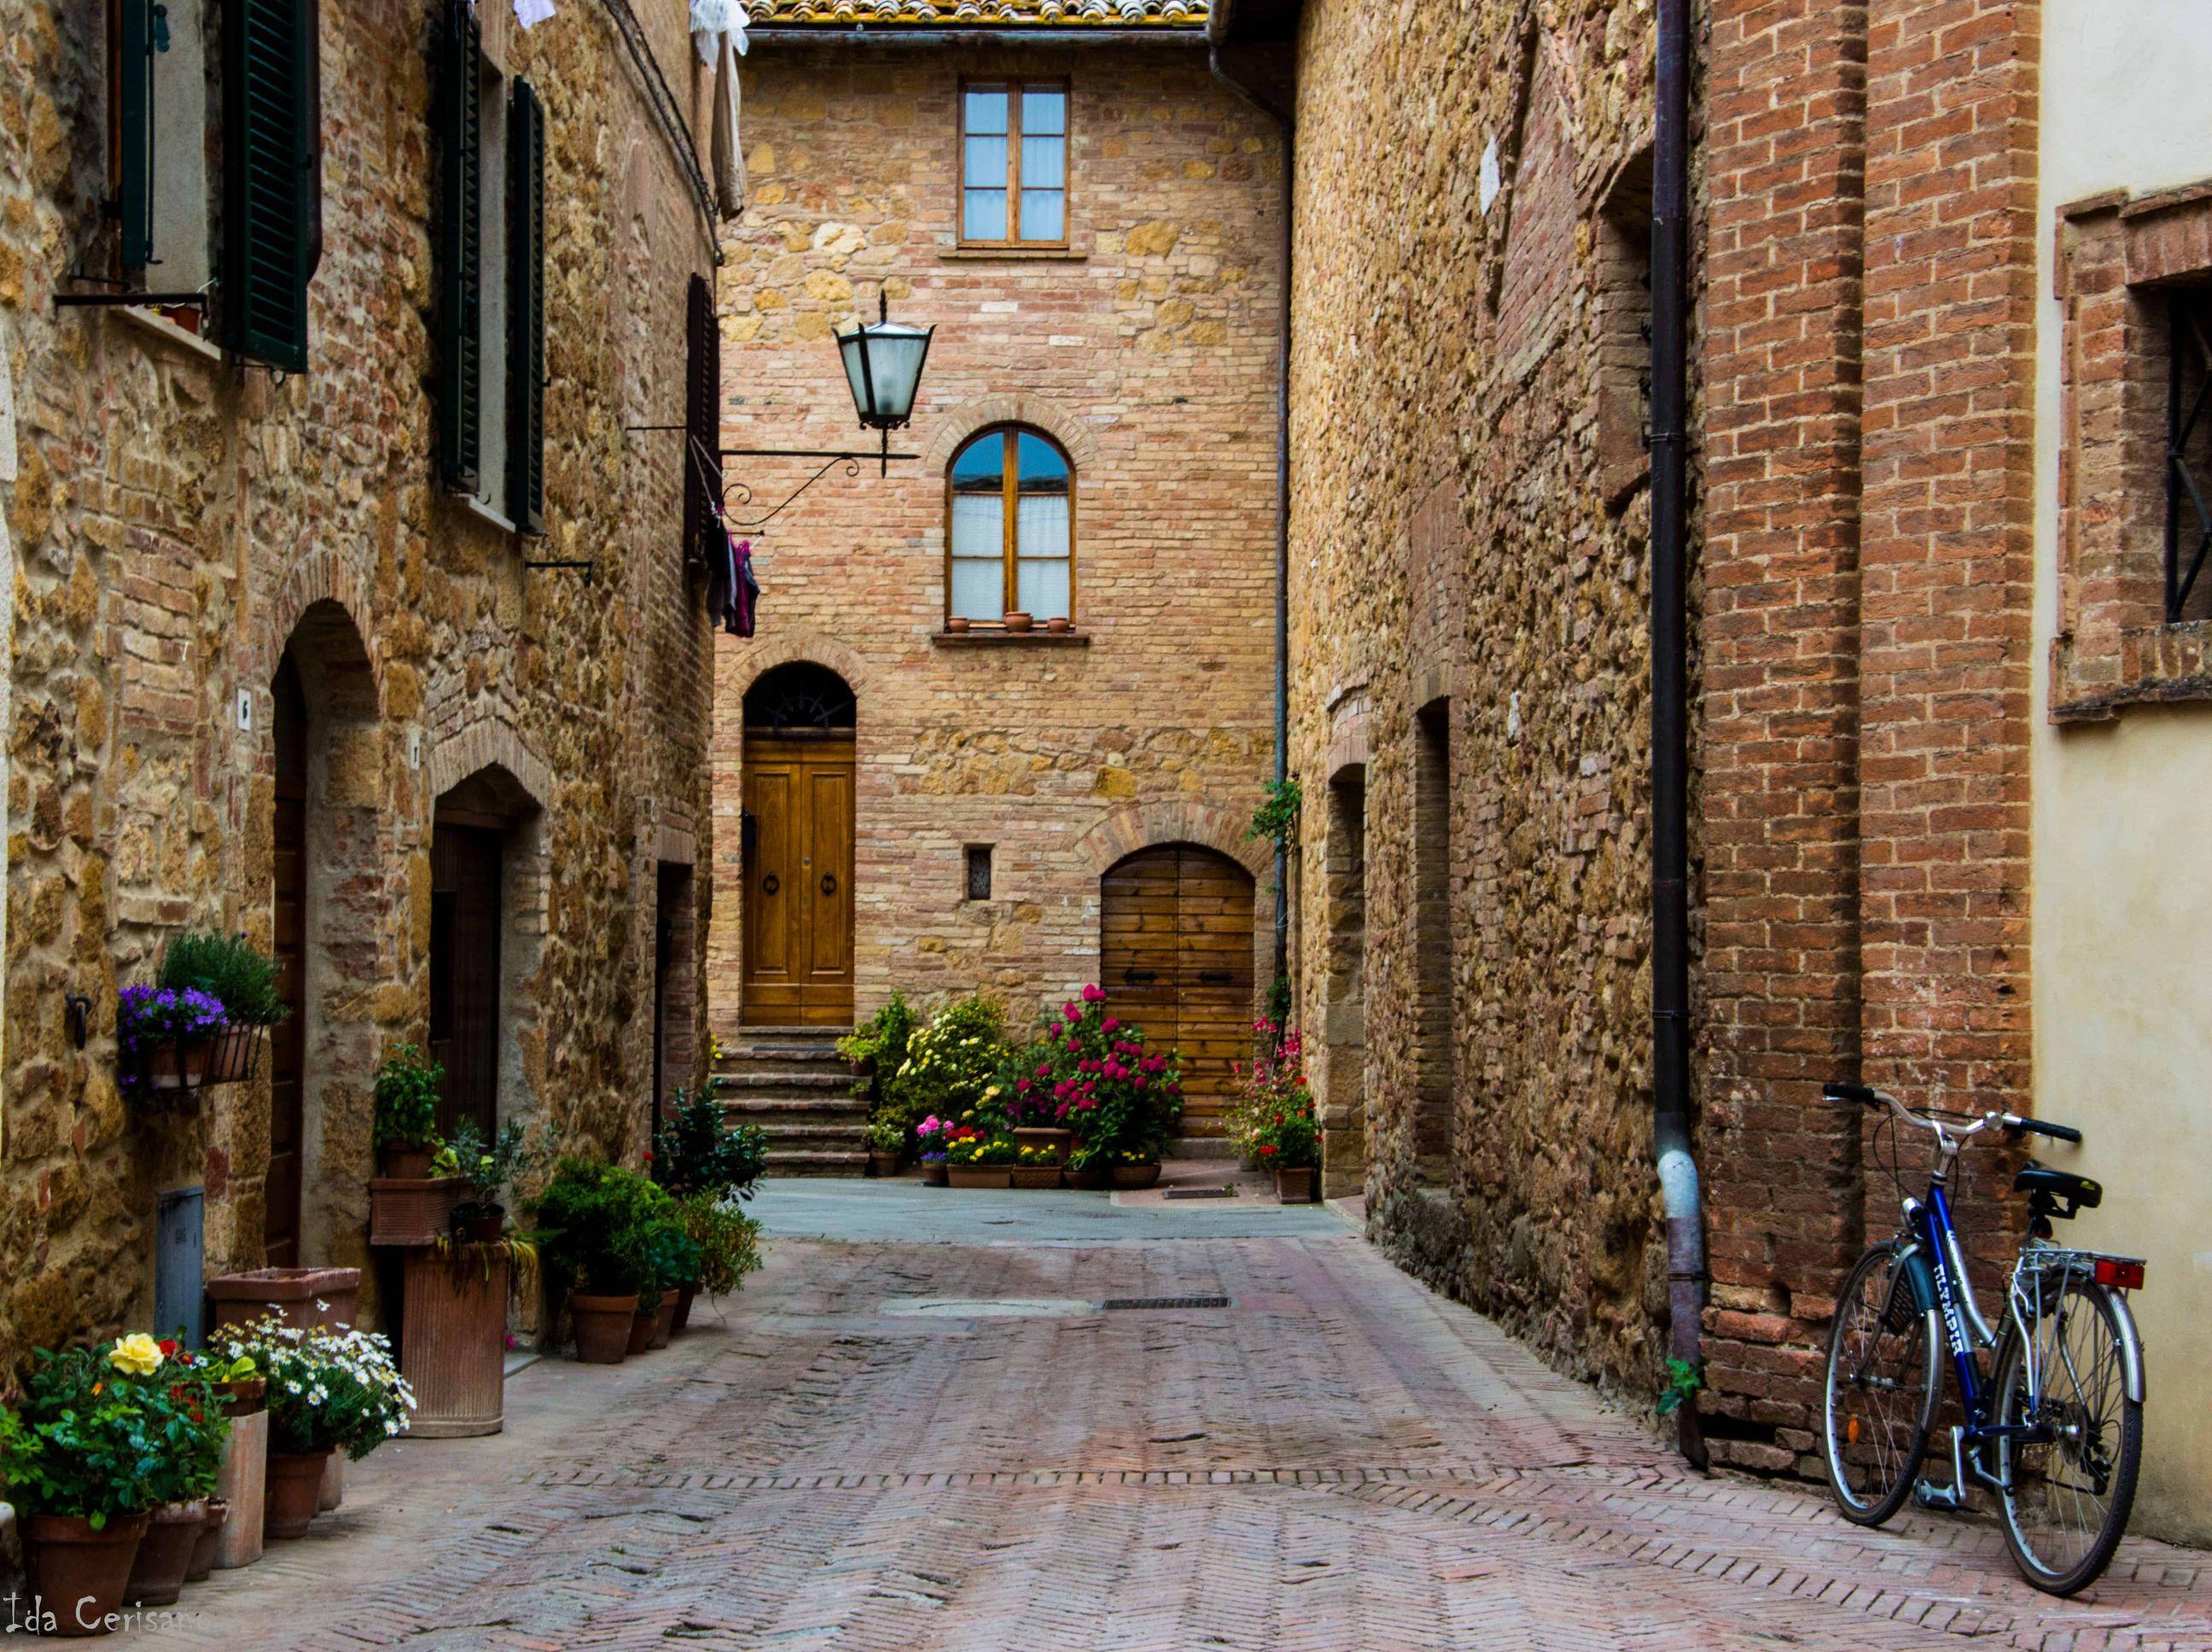 Streets of Pienza